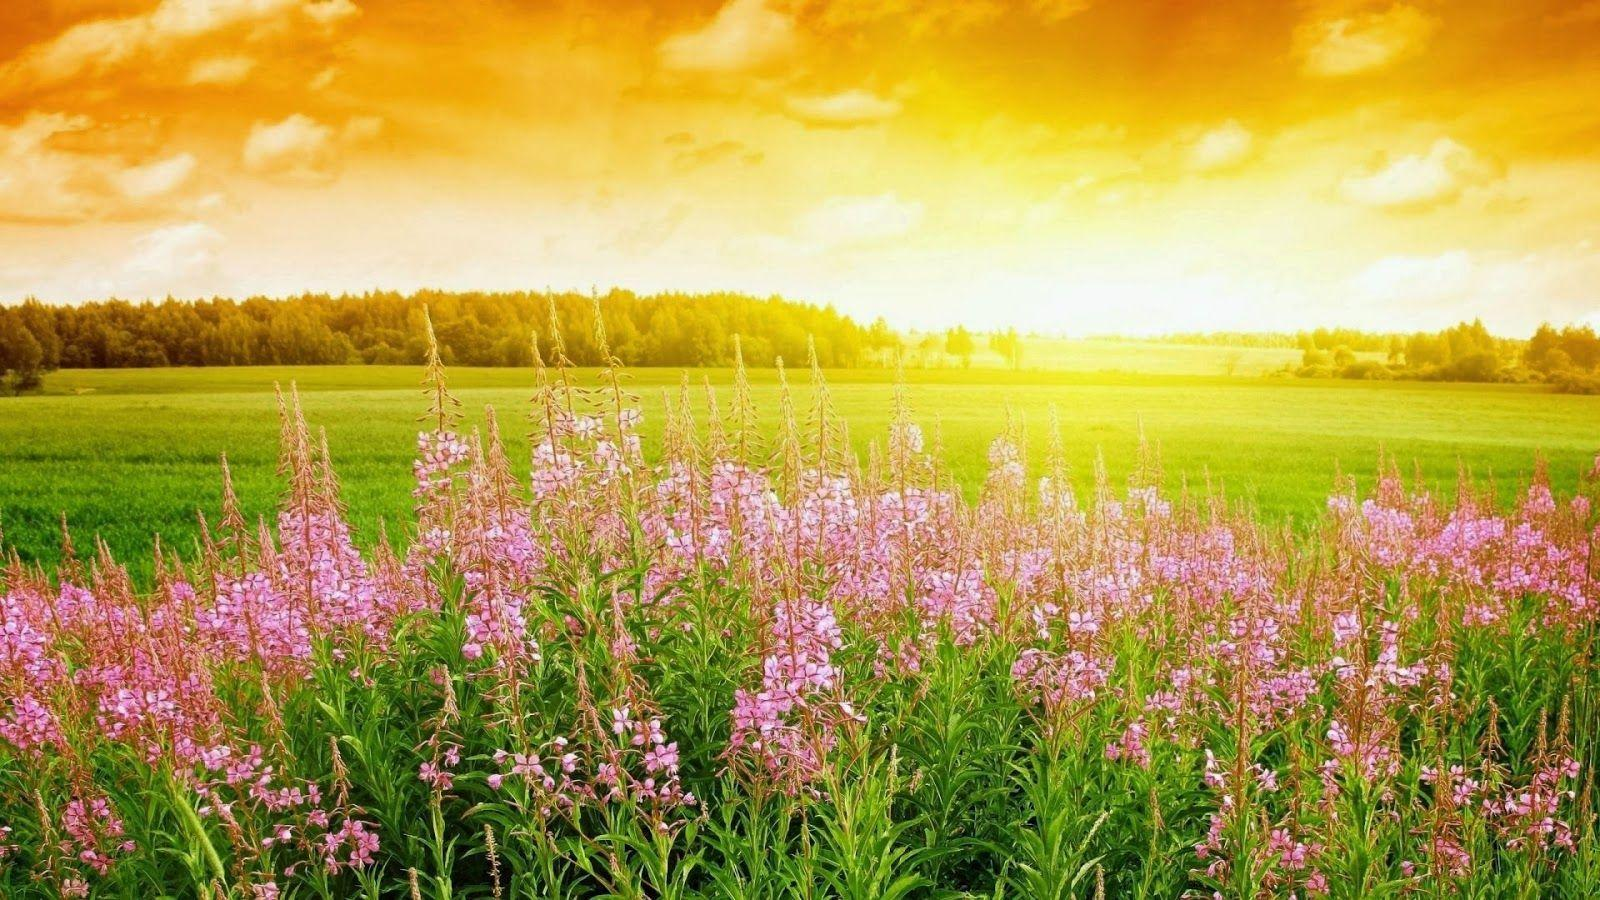 Full Hd Nature Wallpapers Free Download For Laptop - Summer Season In Pakistan - HD Wallpaper